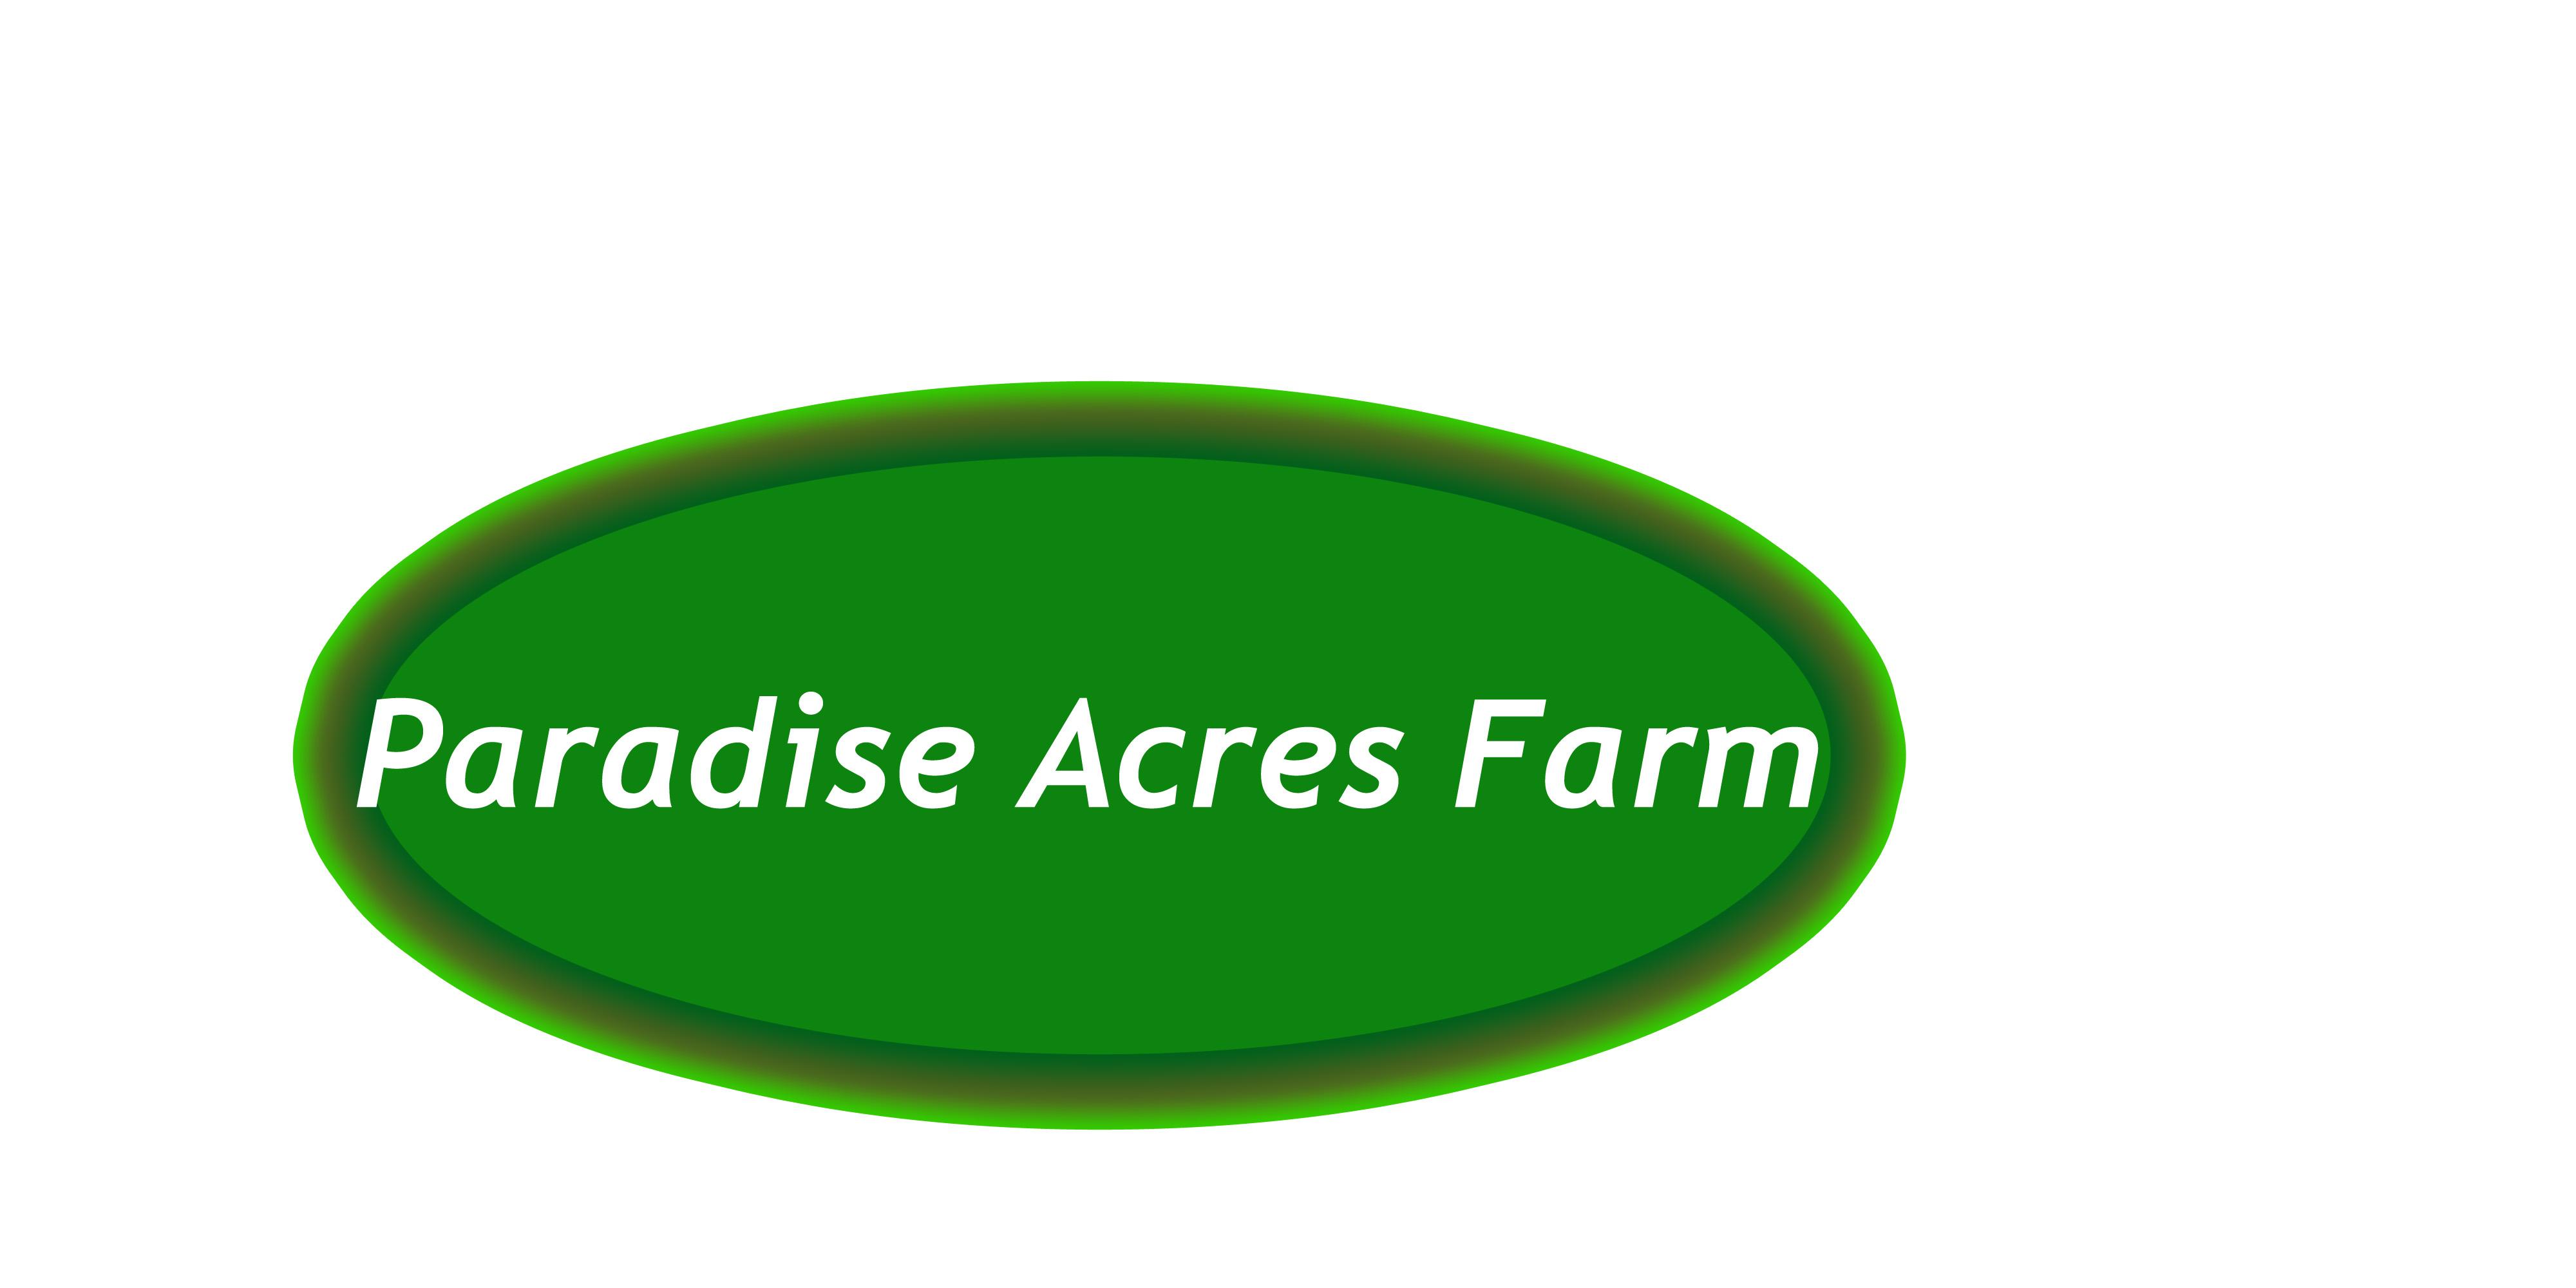 Paradise Acres Farm